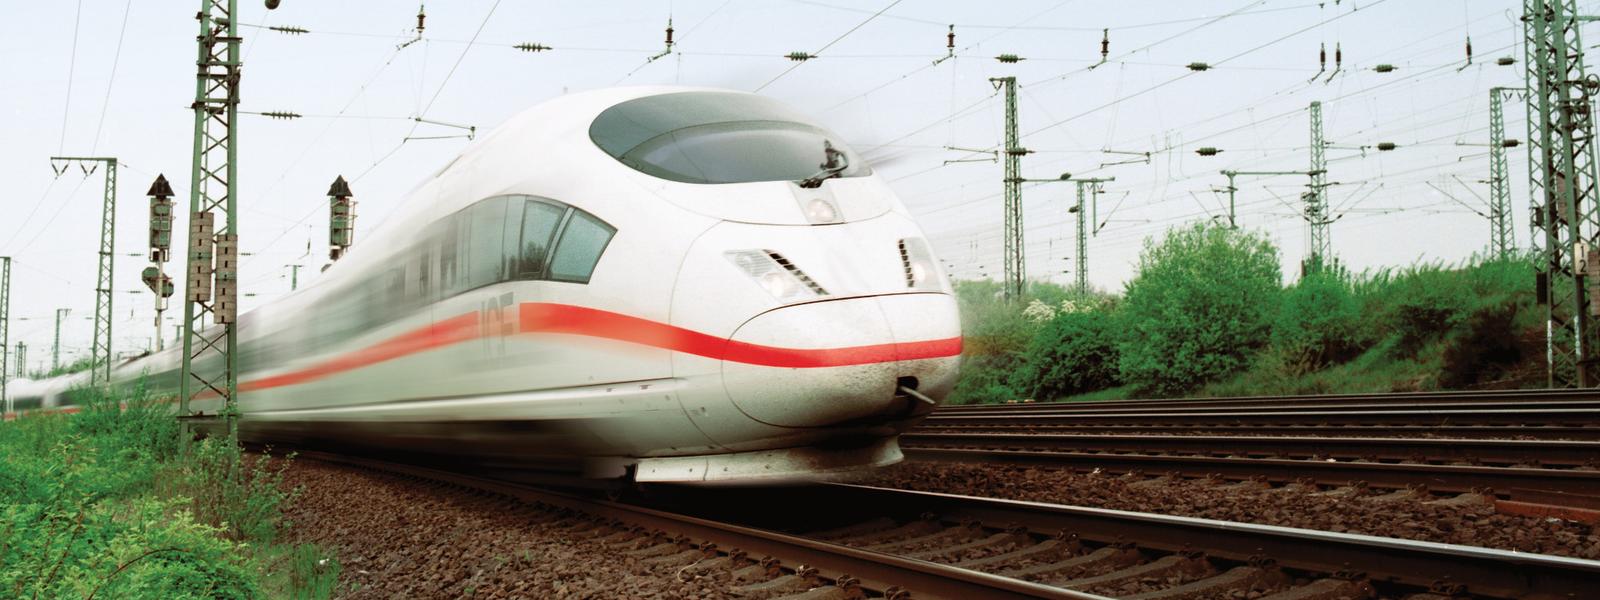 ICE train on rails